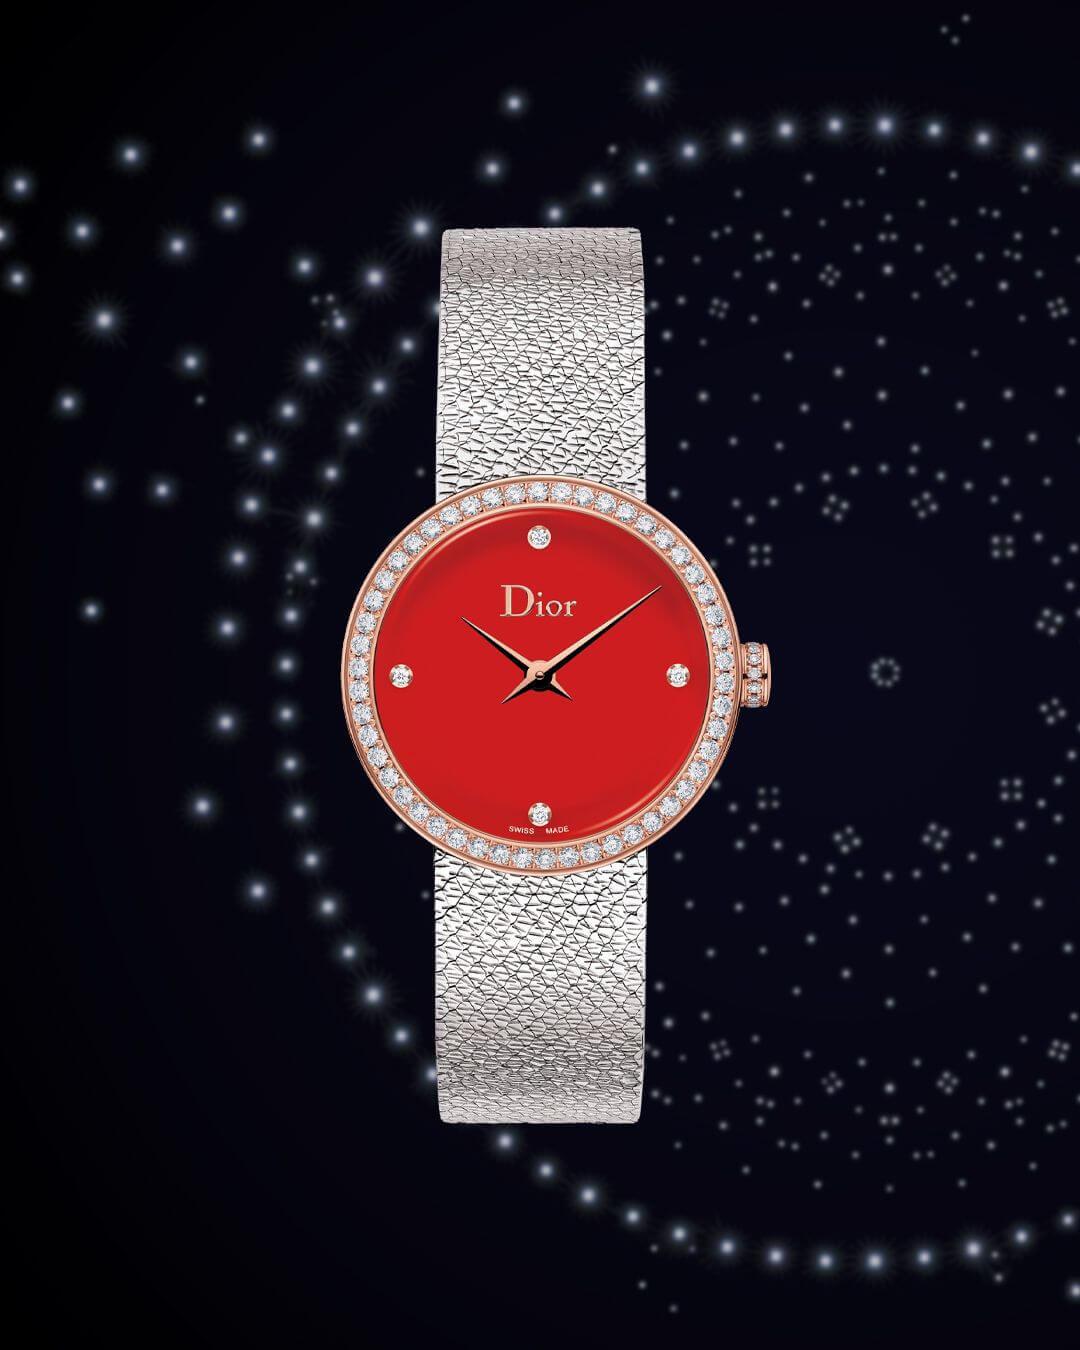 Dior Joaillerie mücevher saat fotoğraf